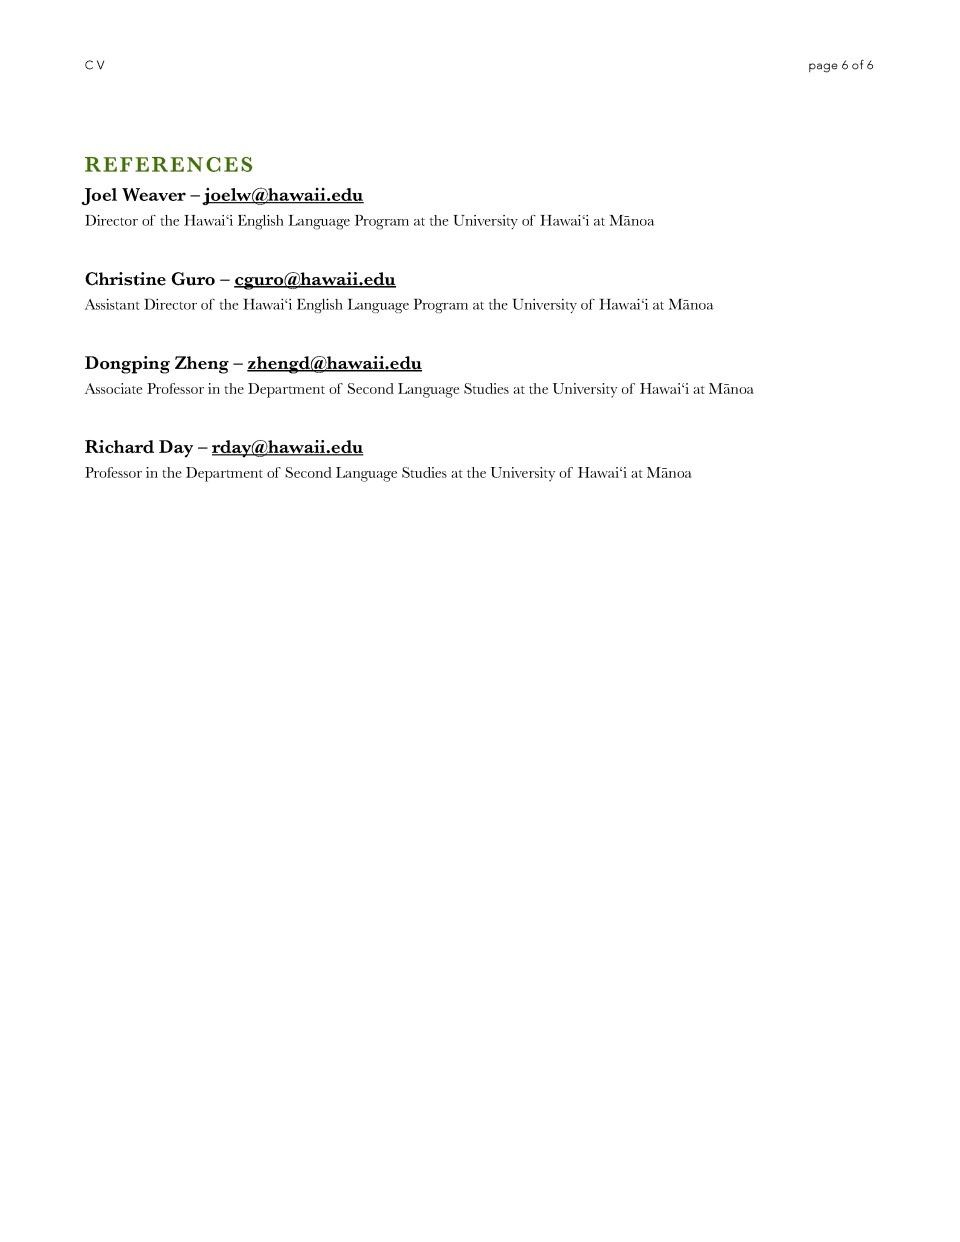 CV (October 5th, 2014)_Page_6